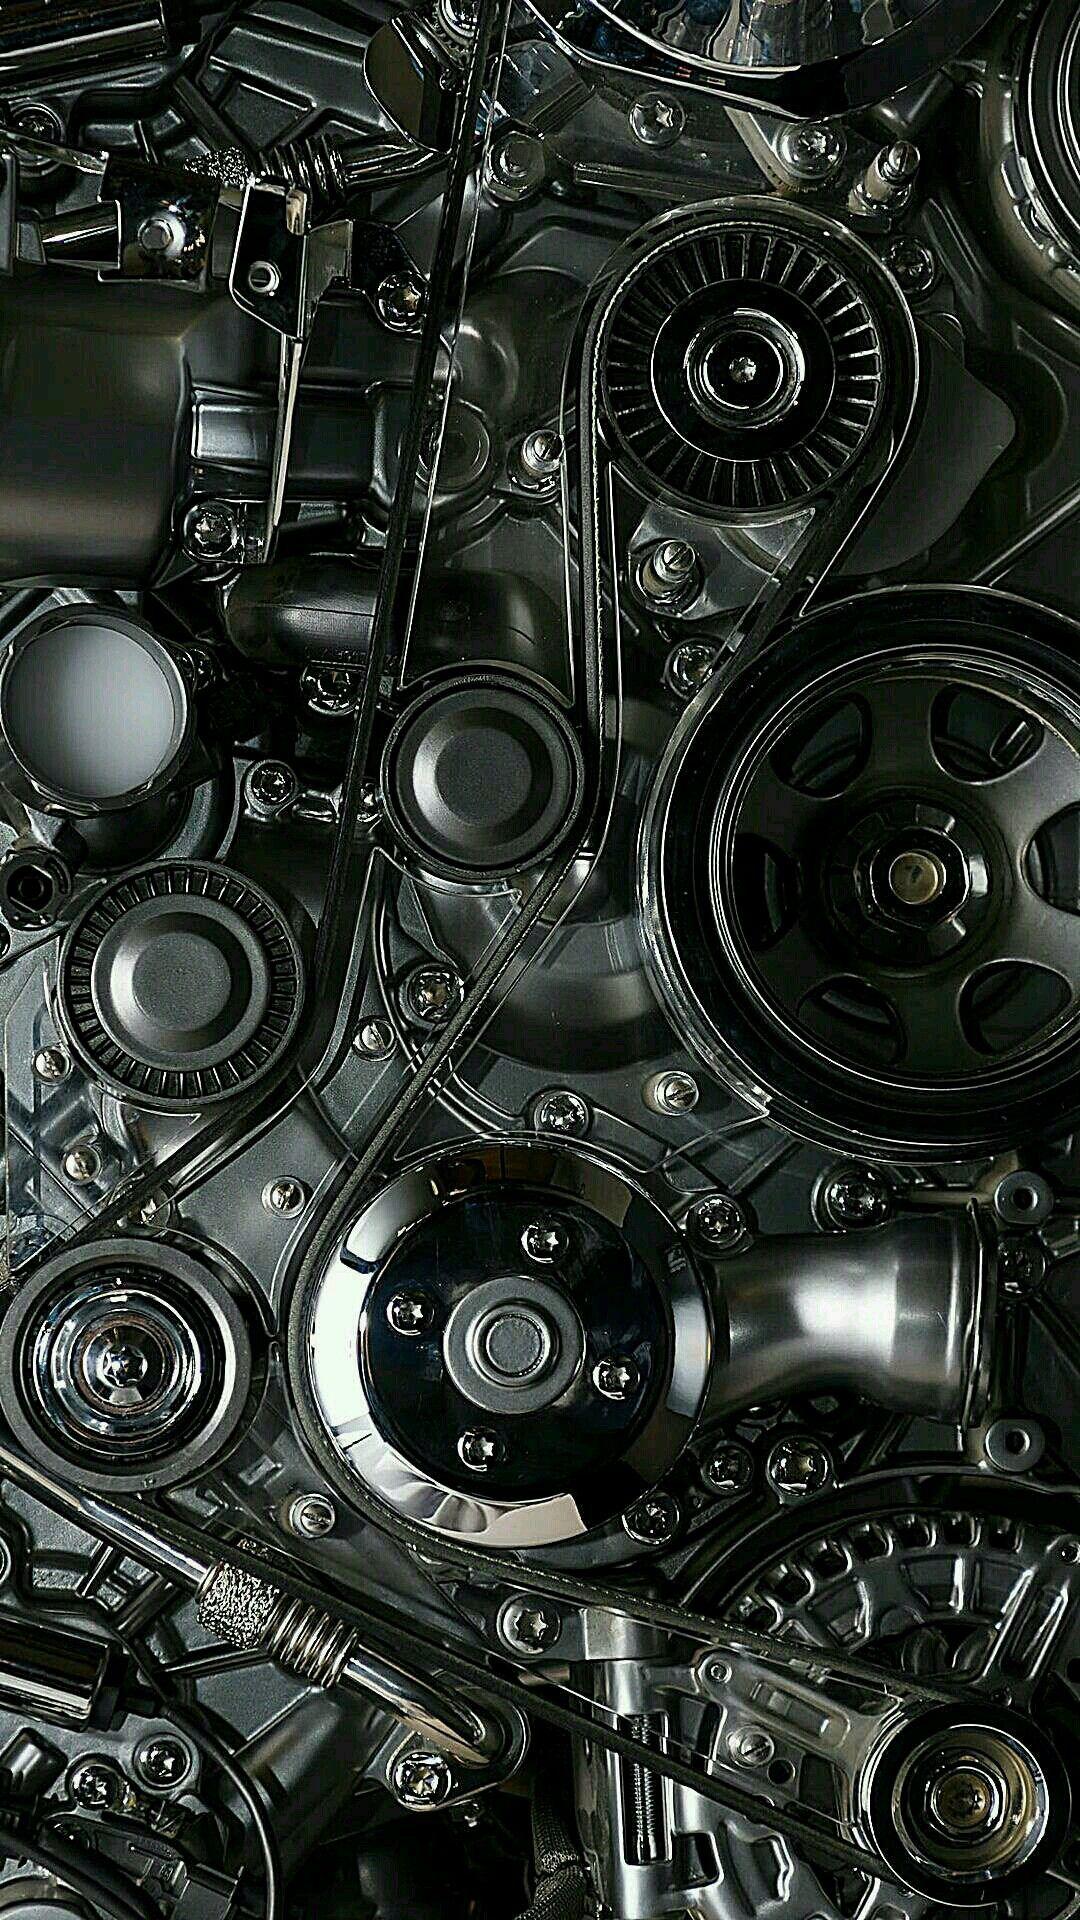 Pin De Rashid Mehmood Em Darkify Papel De Parede Steampunk Papel De Parede Samsung Protecao De Tela Celular